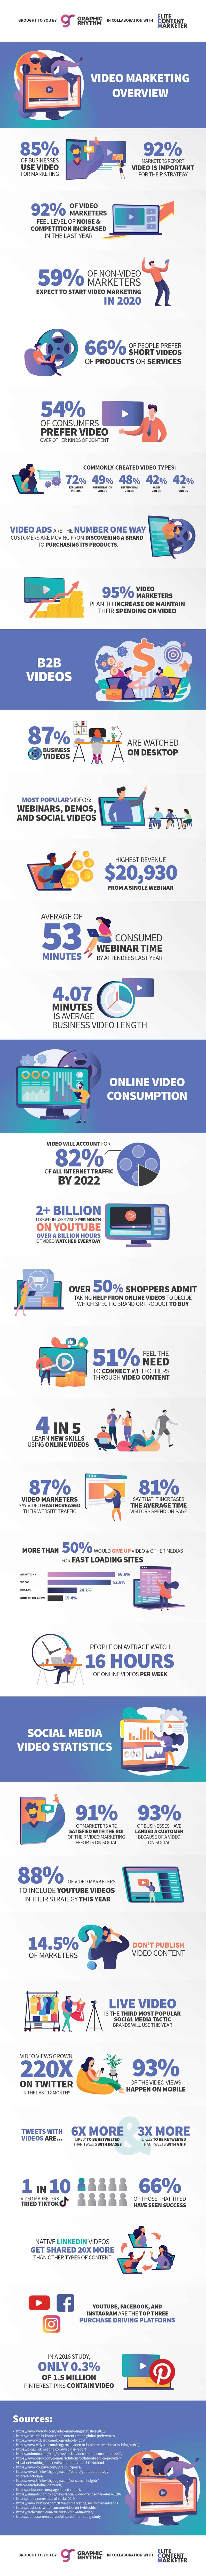 Video Marketing Statistics graphic